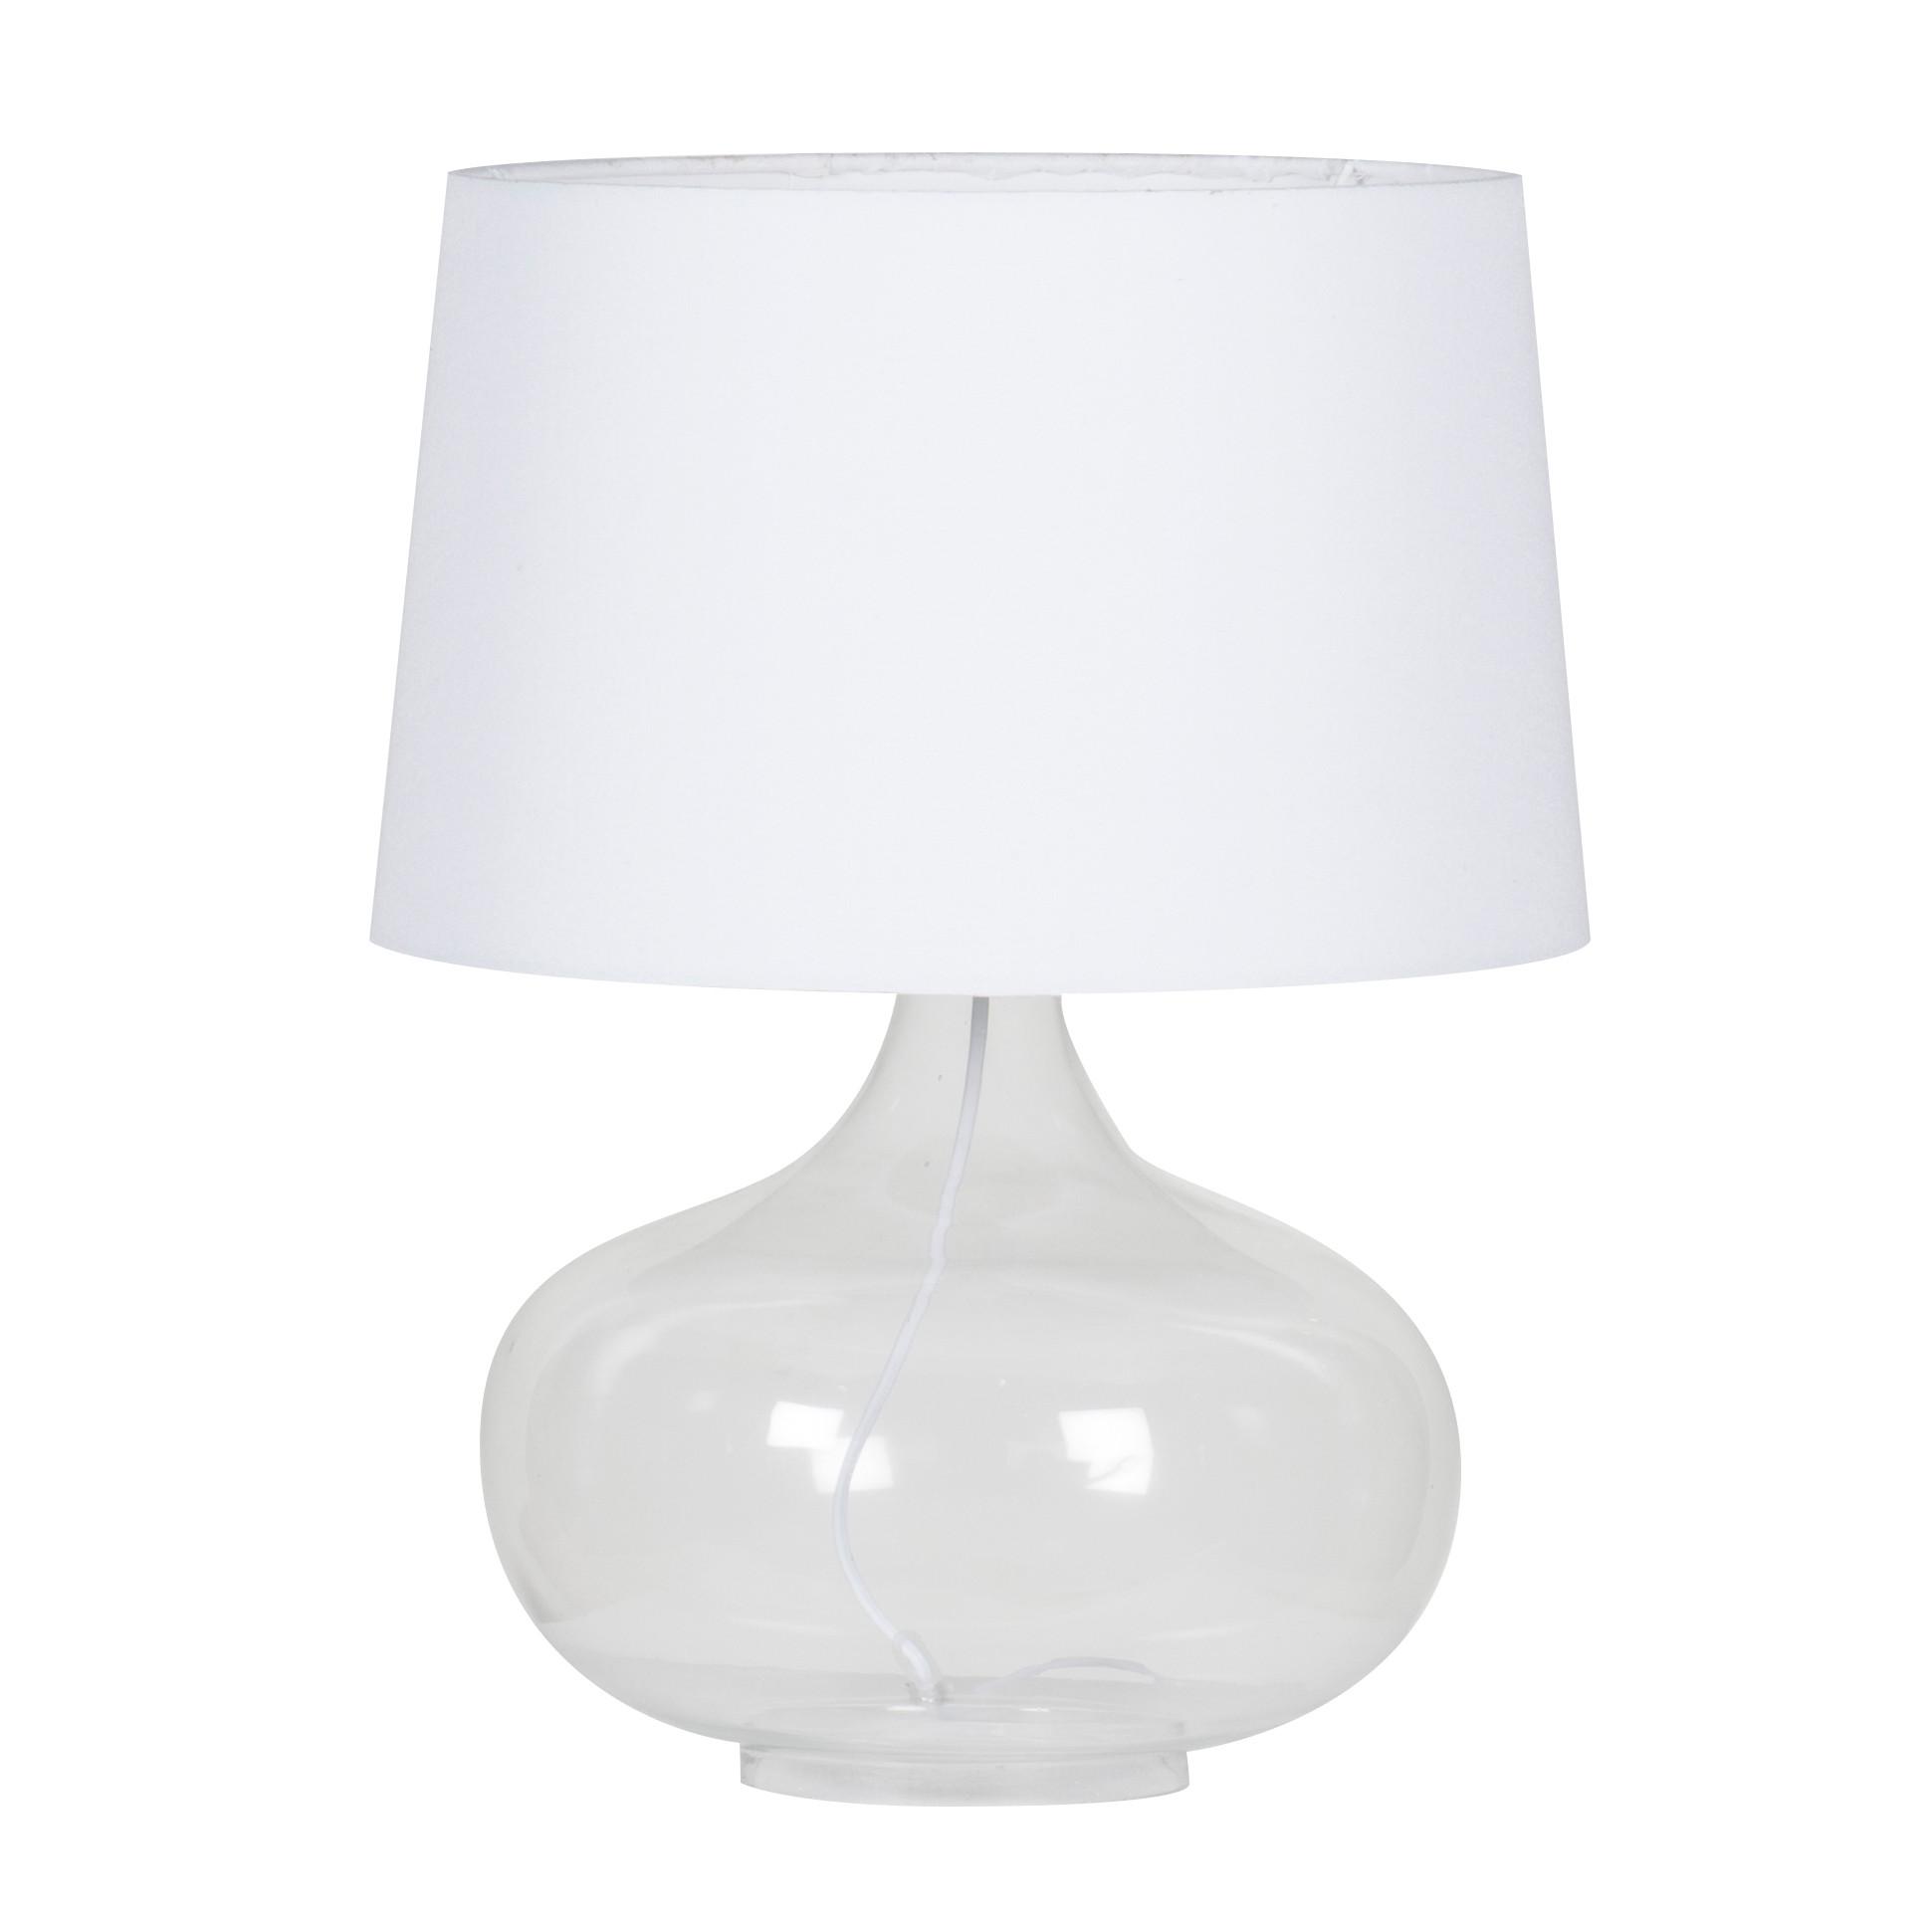 Emery Lamp